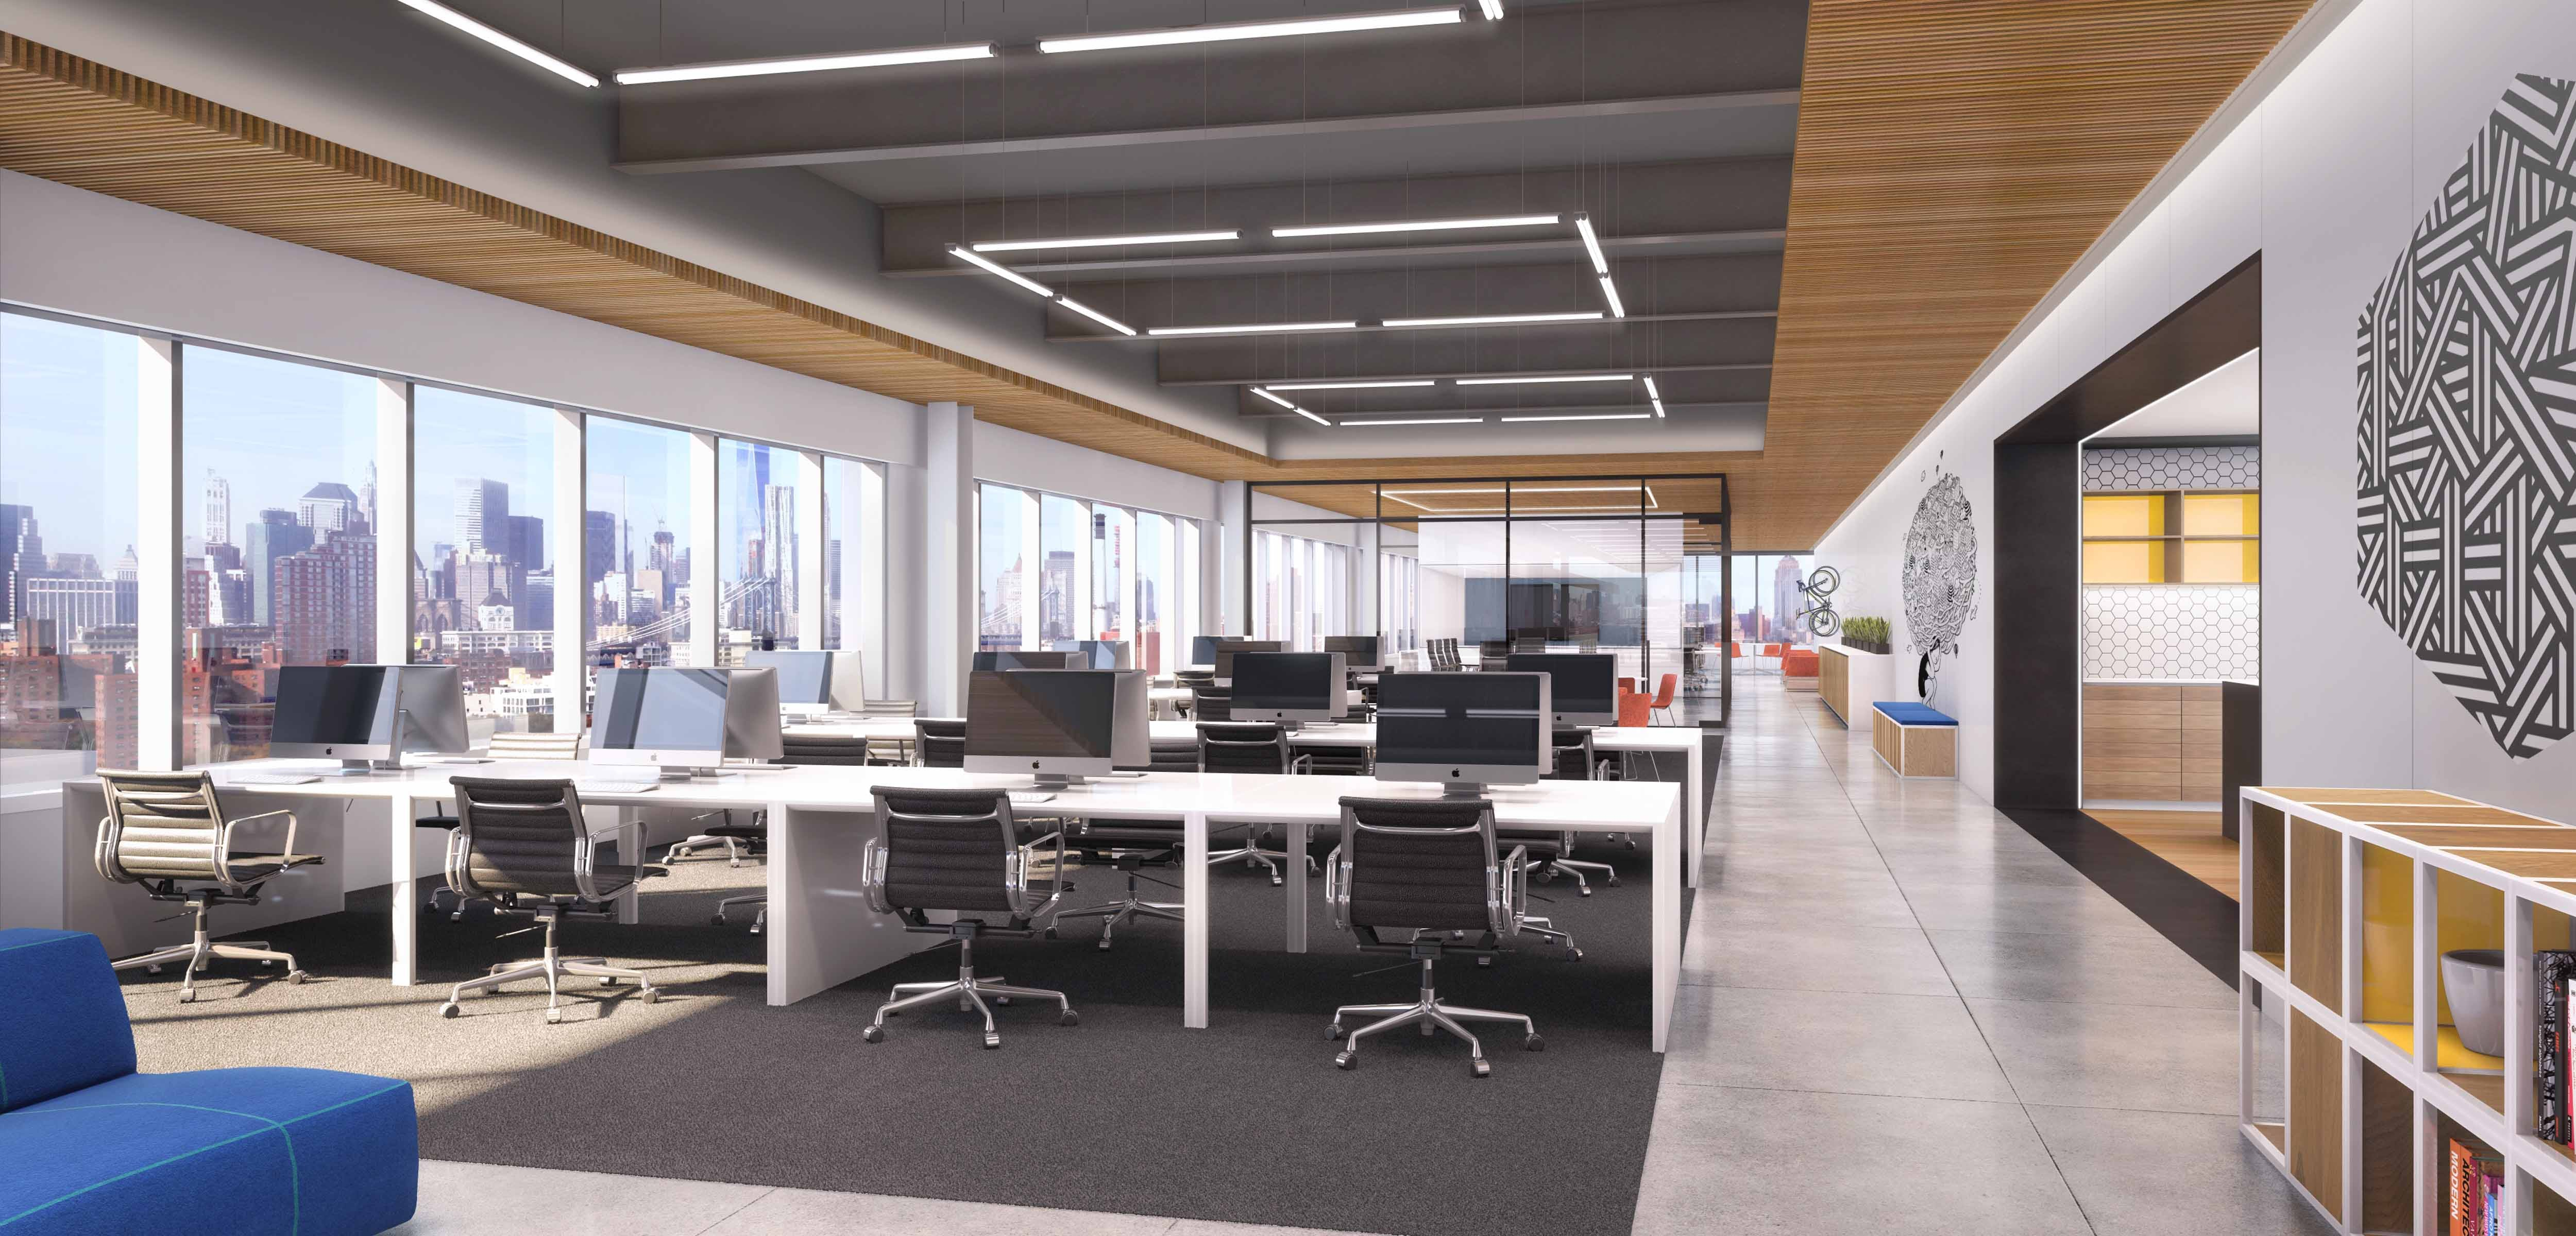 Interior design jobs brooklyn ny billingsblessingbagsorg for Interior designers in brooklyn ny